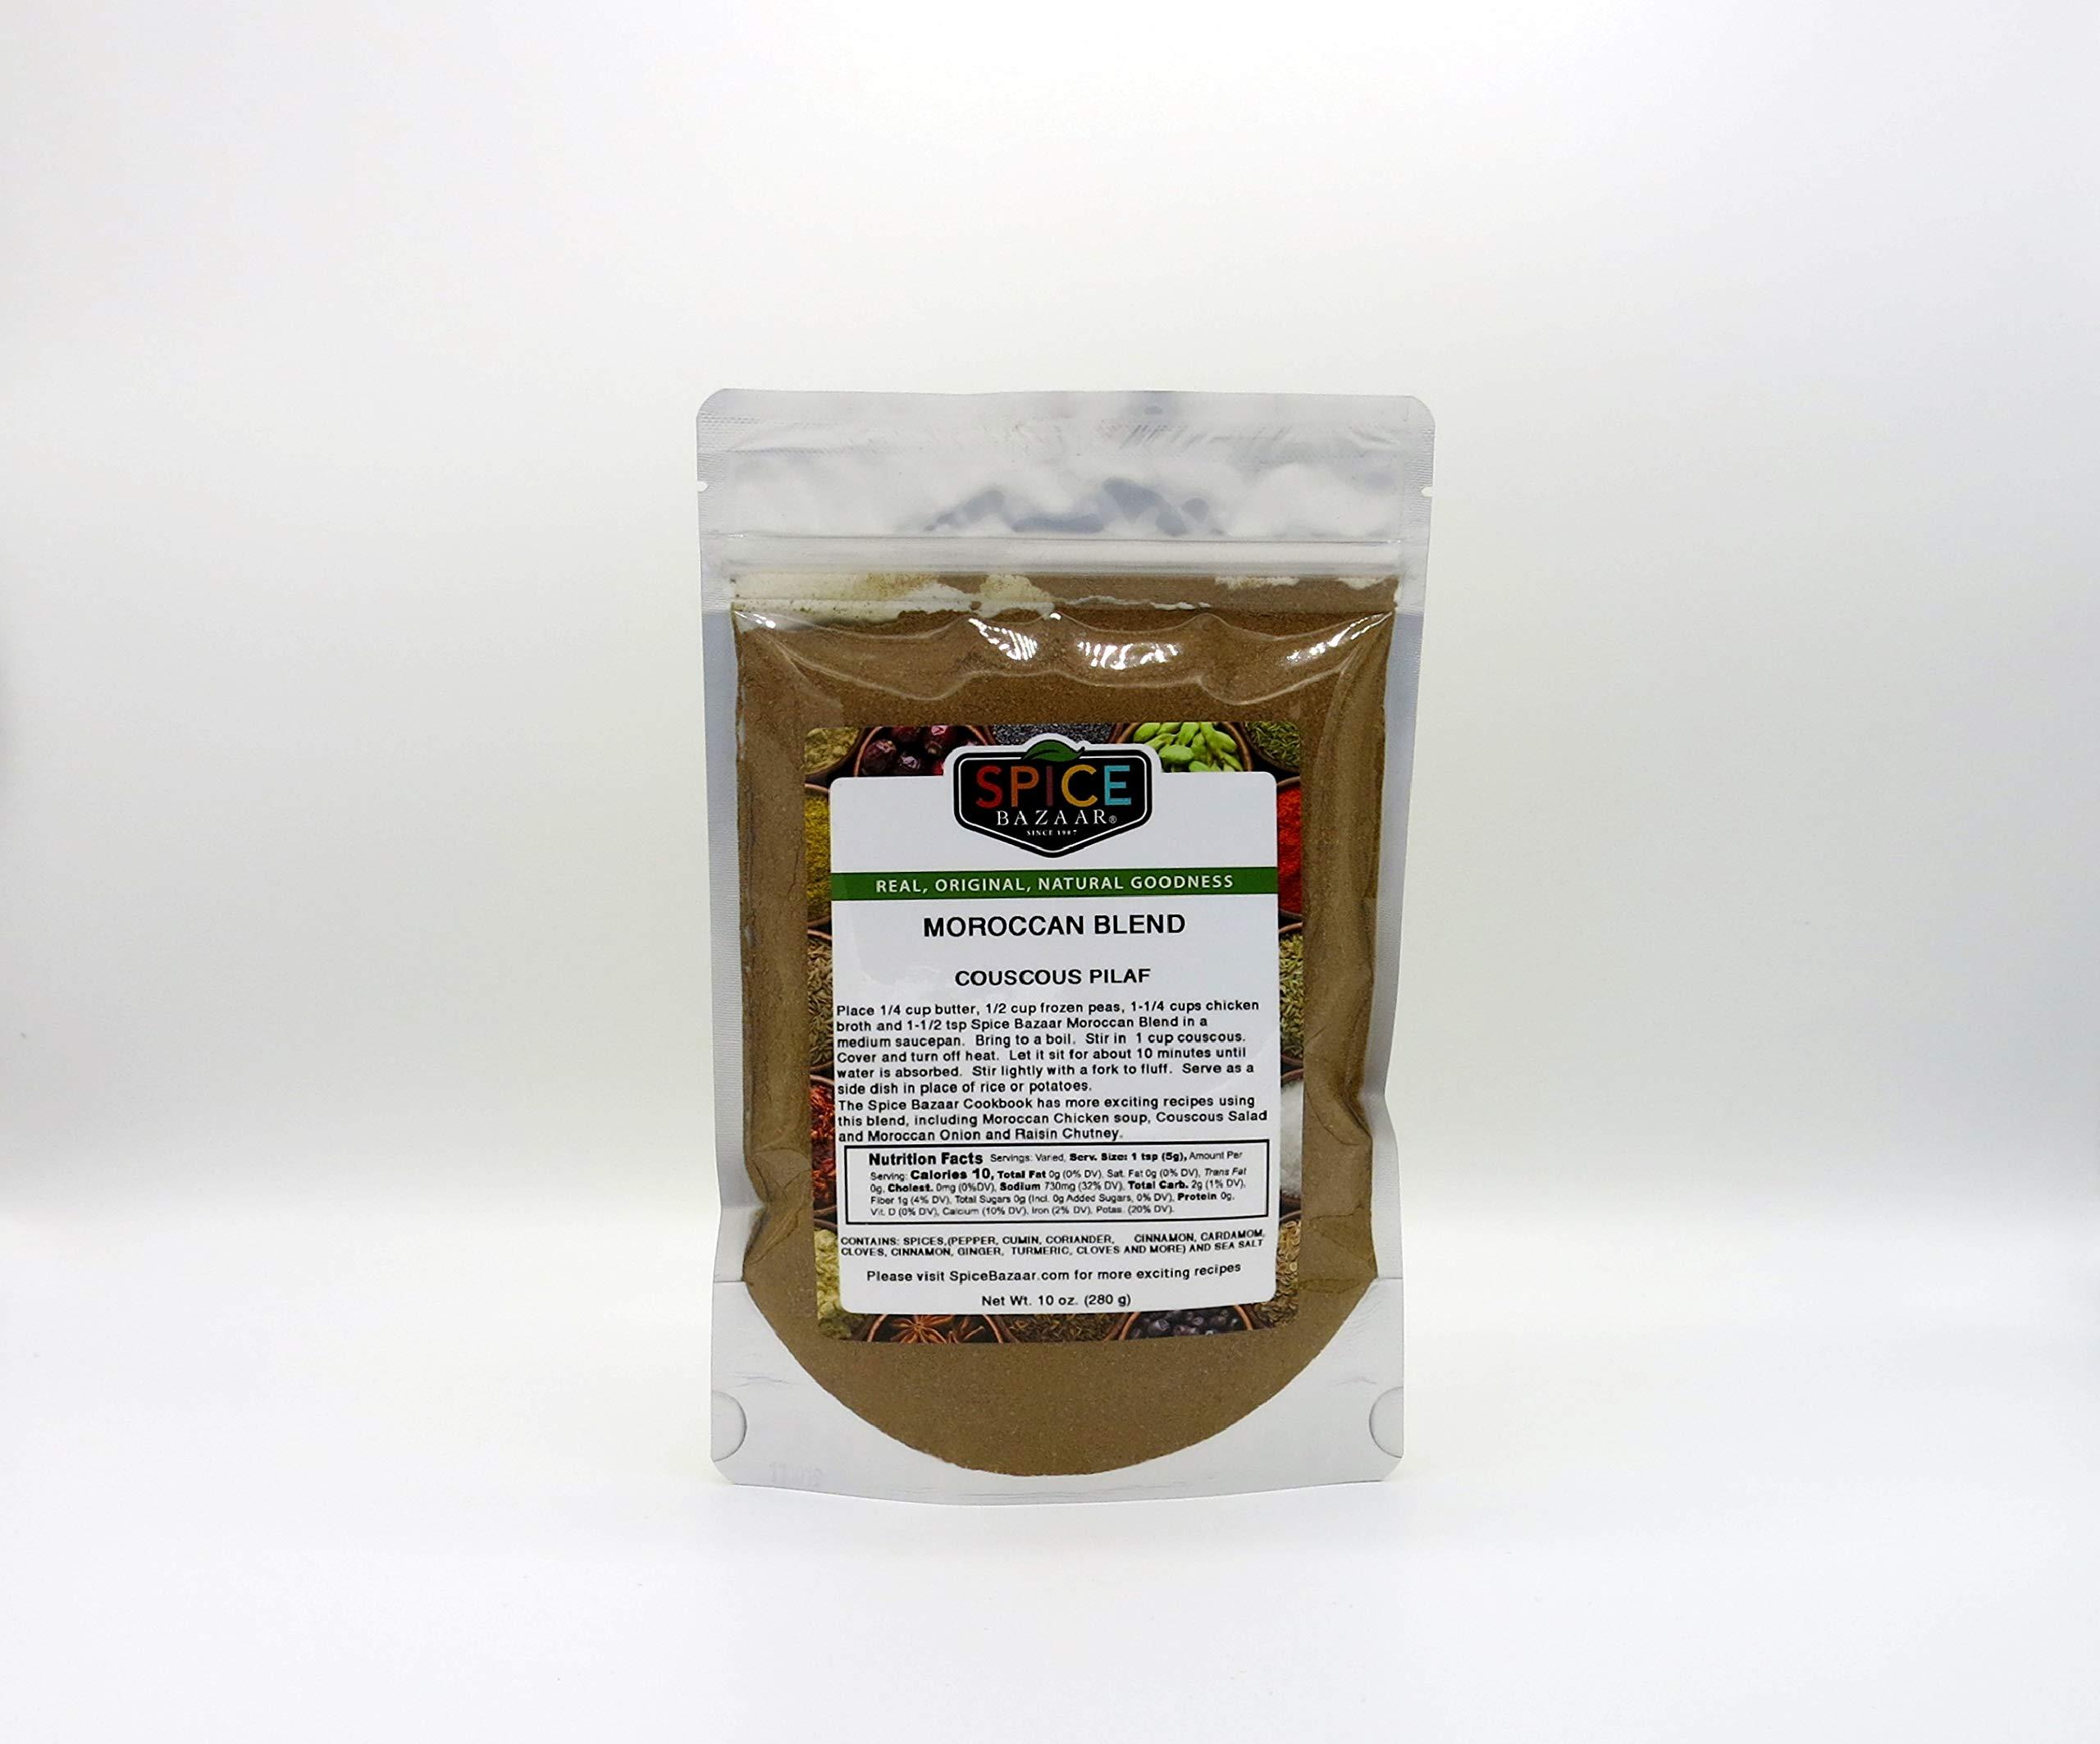 Spice Bazaar Moroccan Blend - 9.75 oz